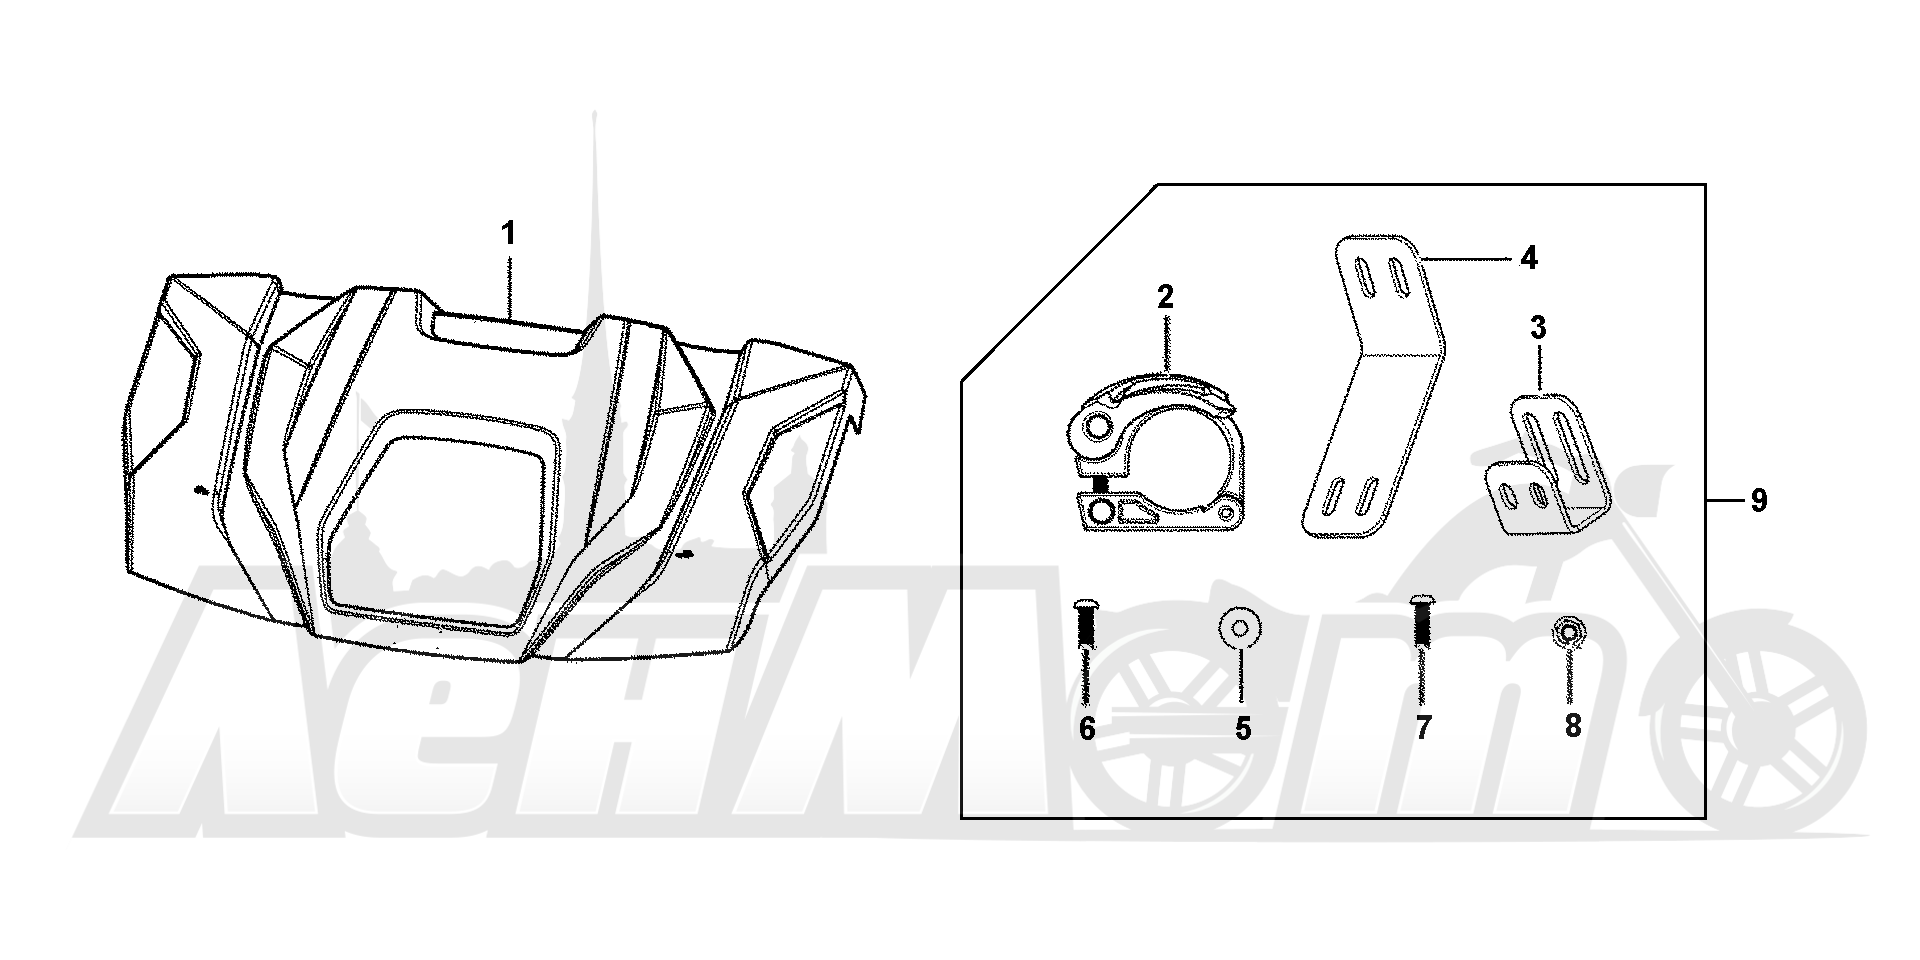 Запчасти для Квадроцикла Honda 2019 SXS1000M5L Раздел: HARD ROOF (3P) | HARD крыша (3P)